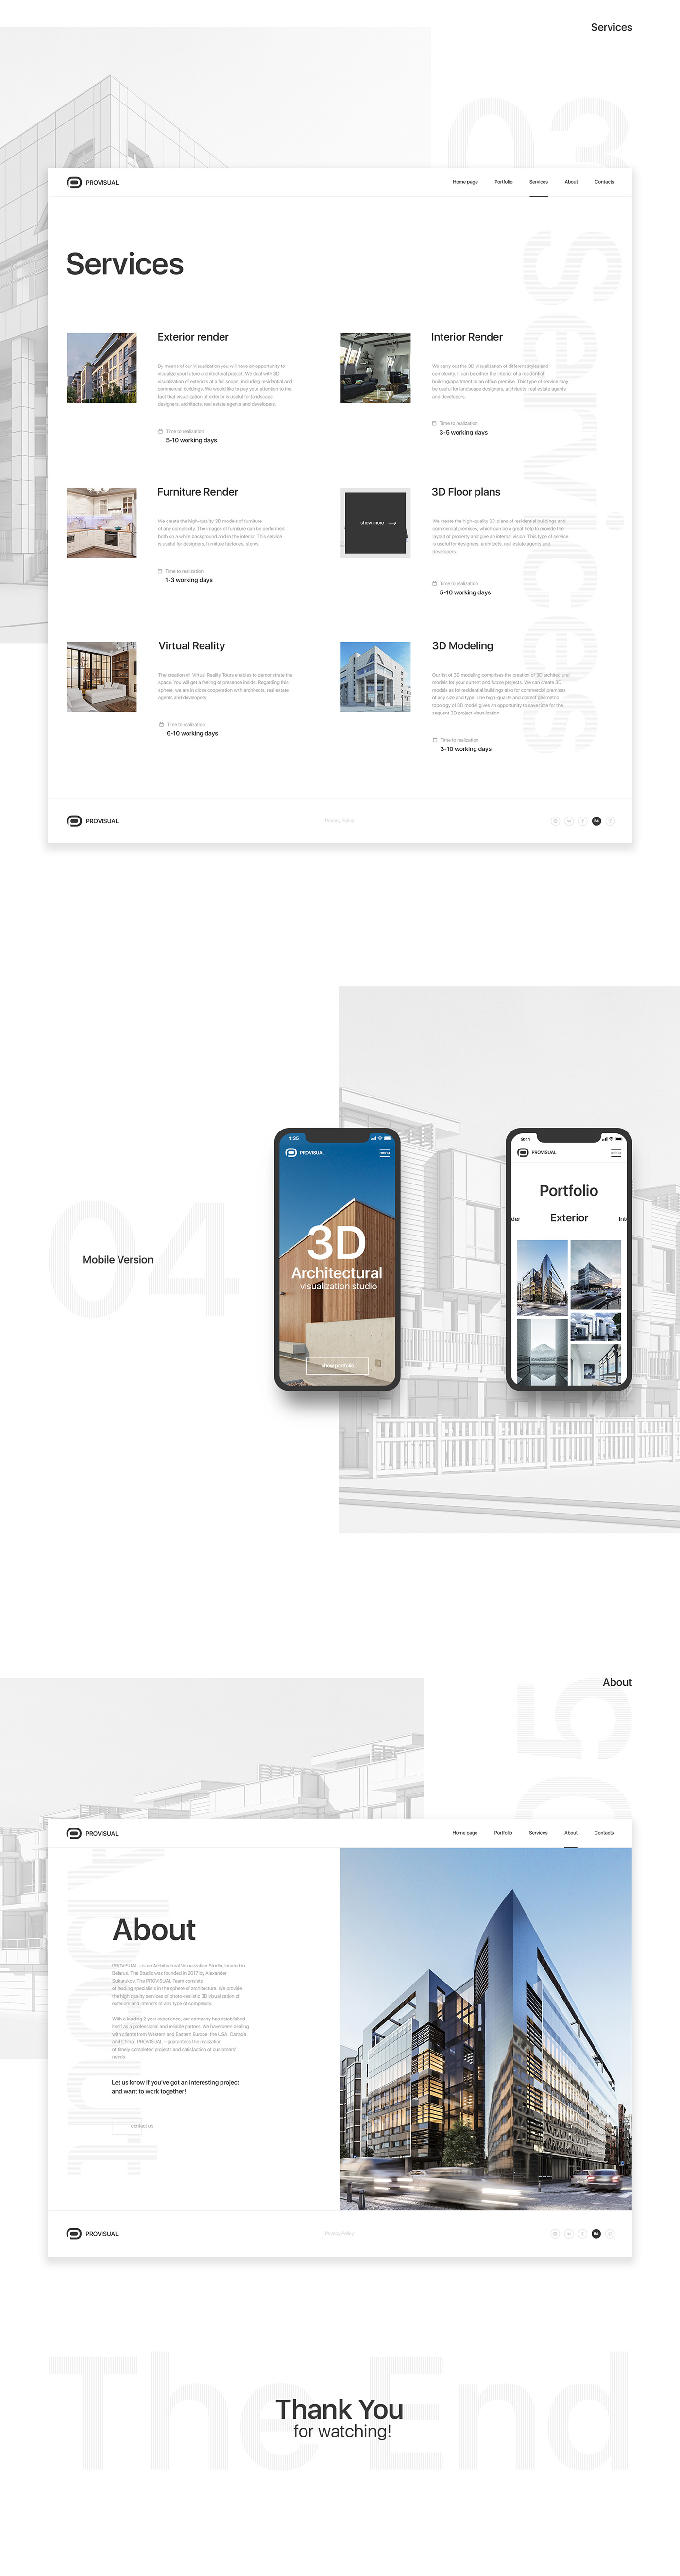 web-design animation  interactive architecture ux UI portfolio Minimalism Website mobile